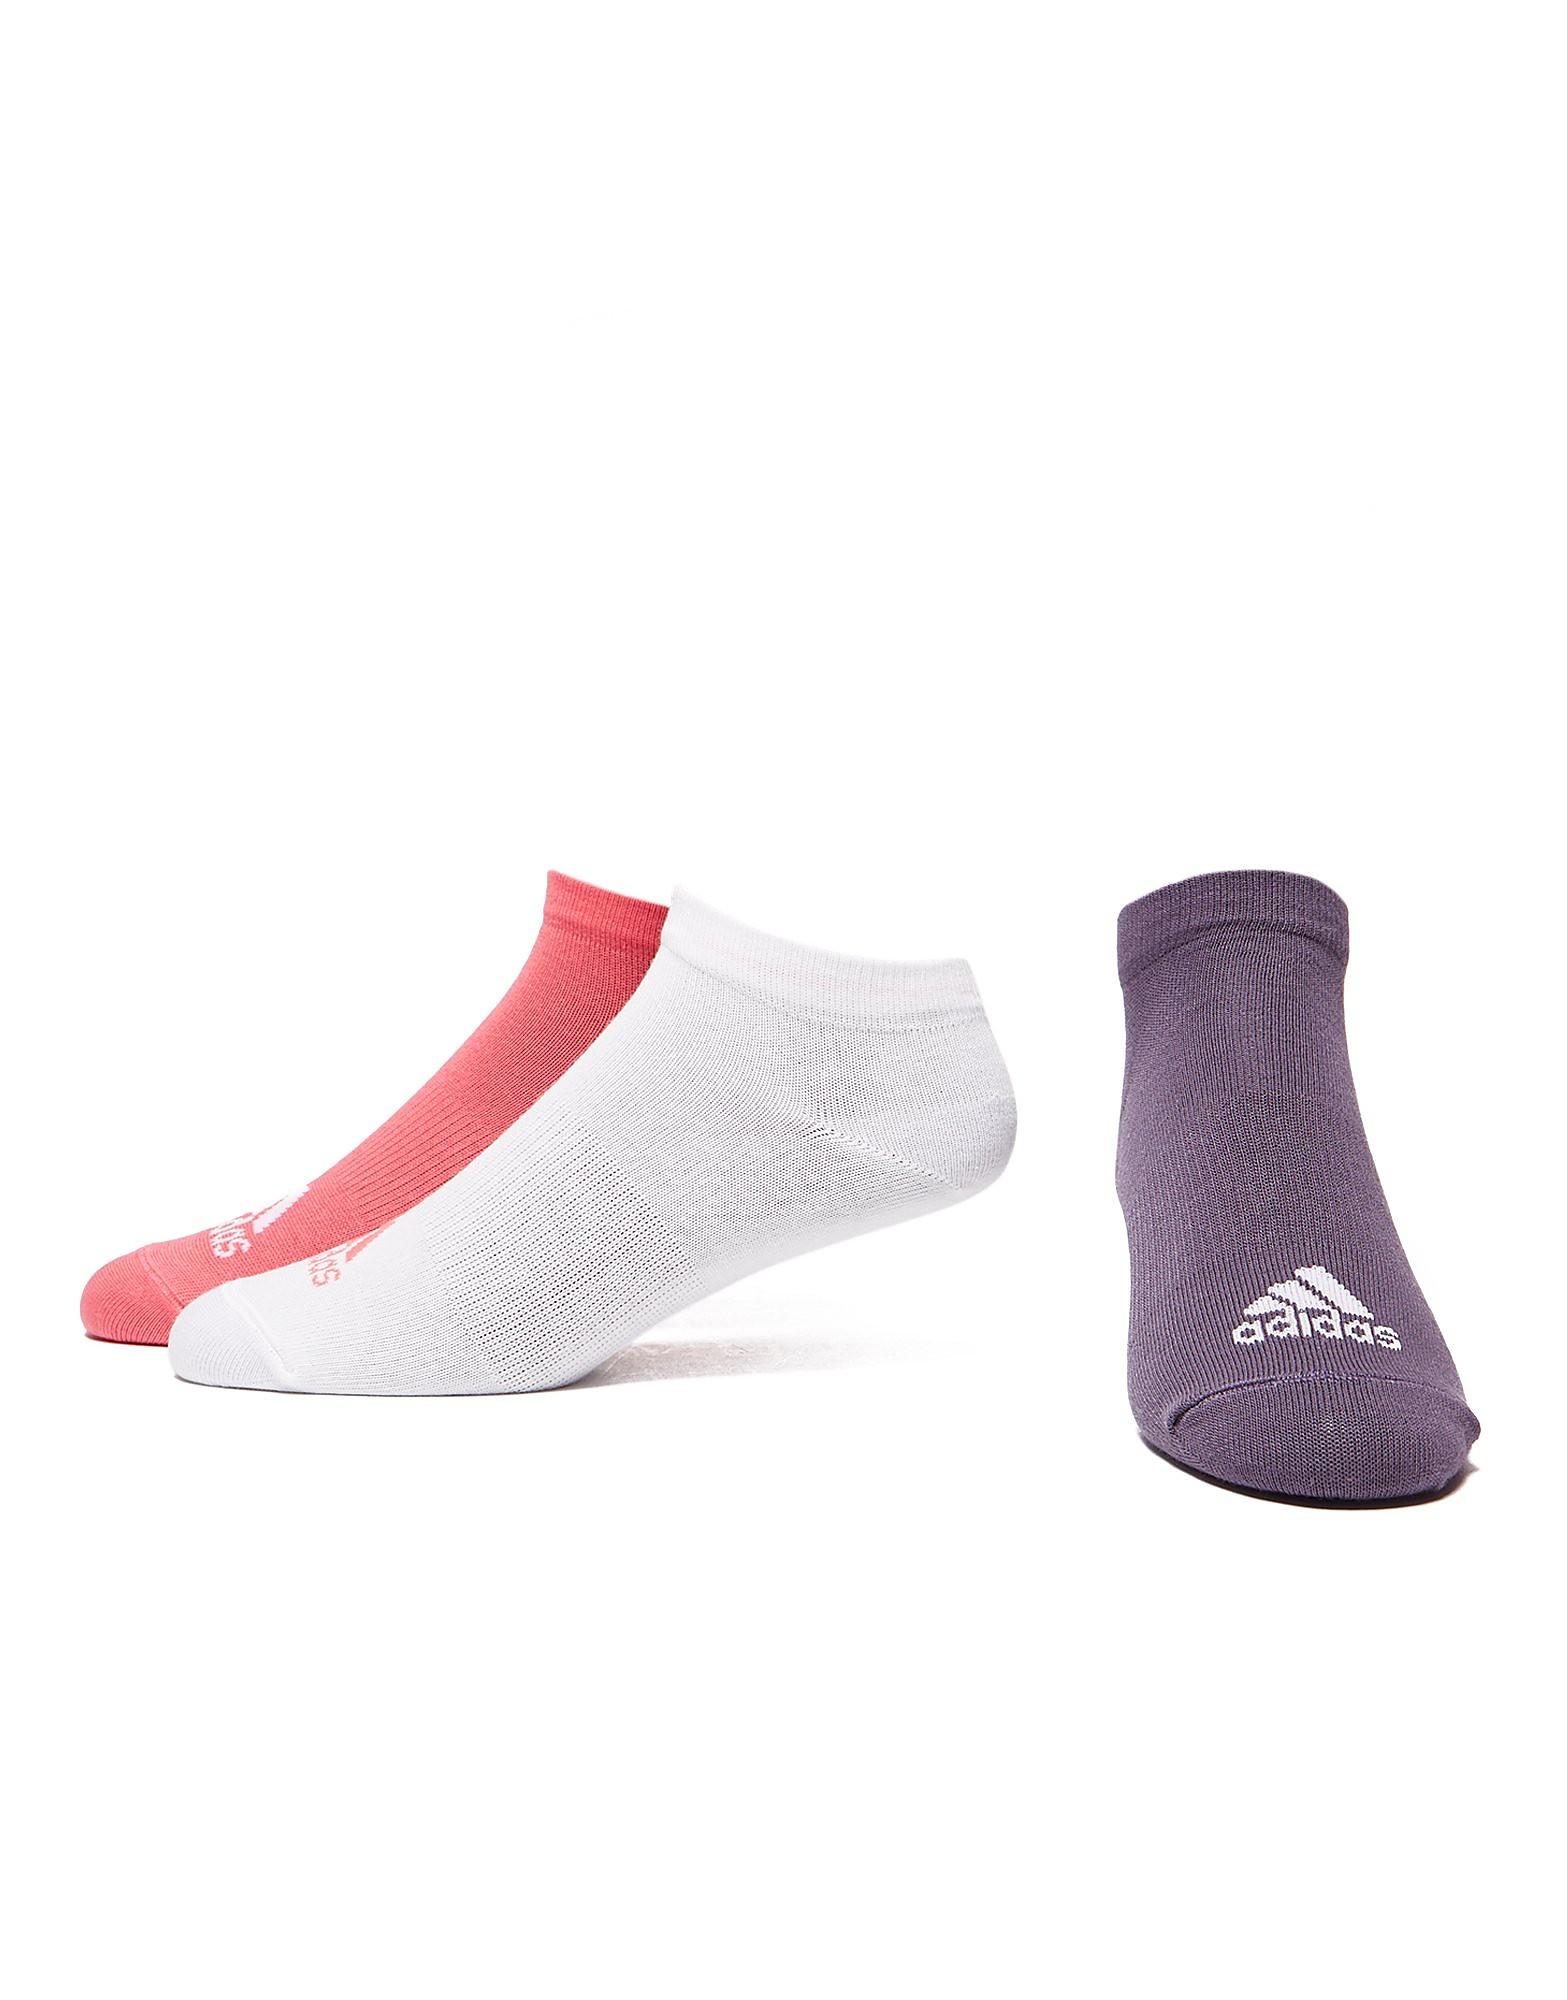 adidas Performance No-Show 3Pack Thin Women's Training Socks